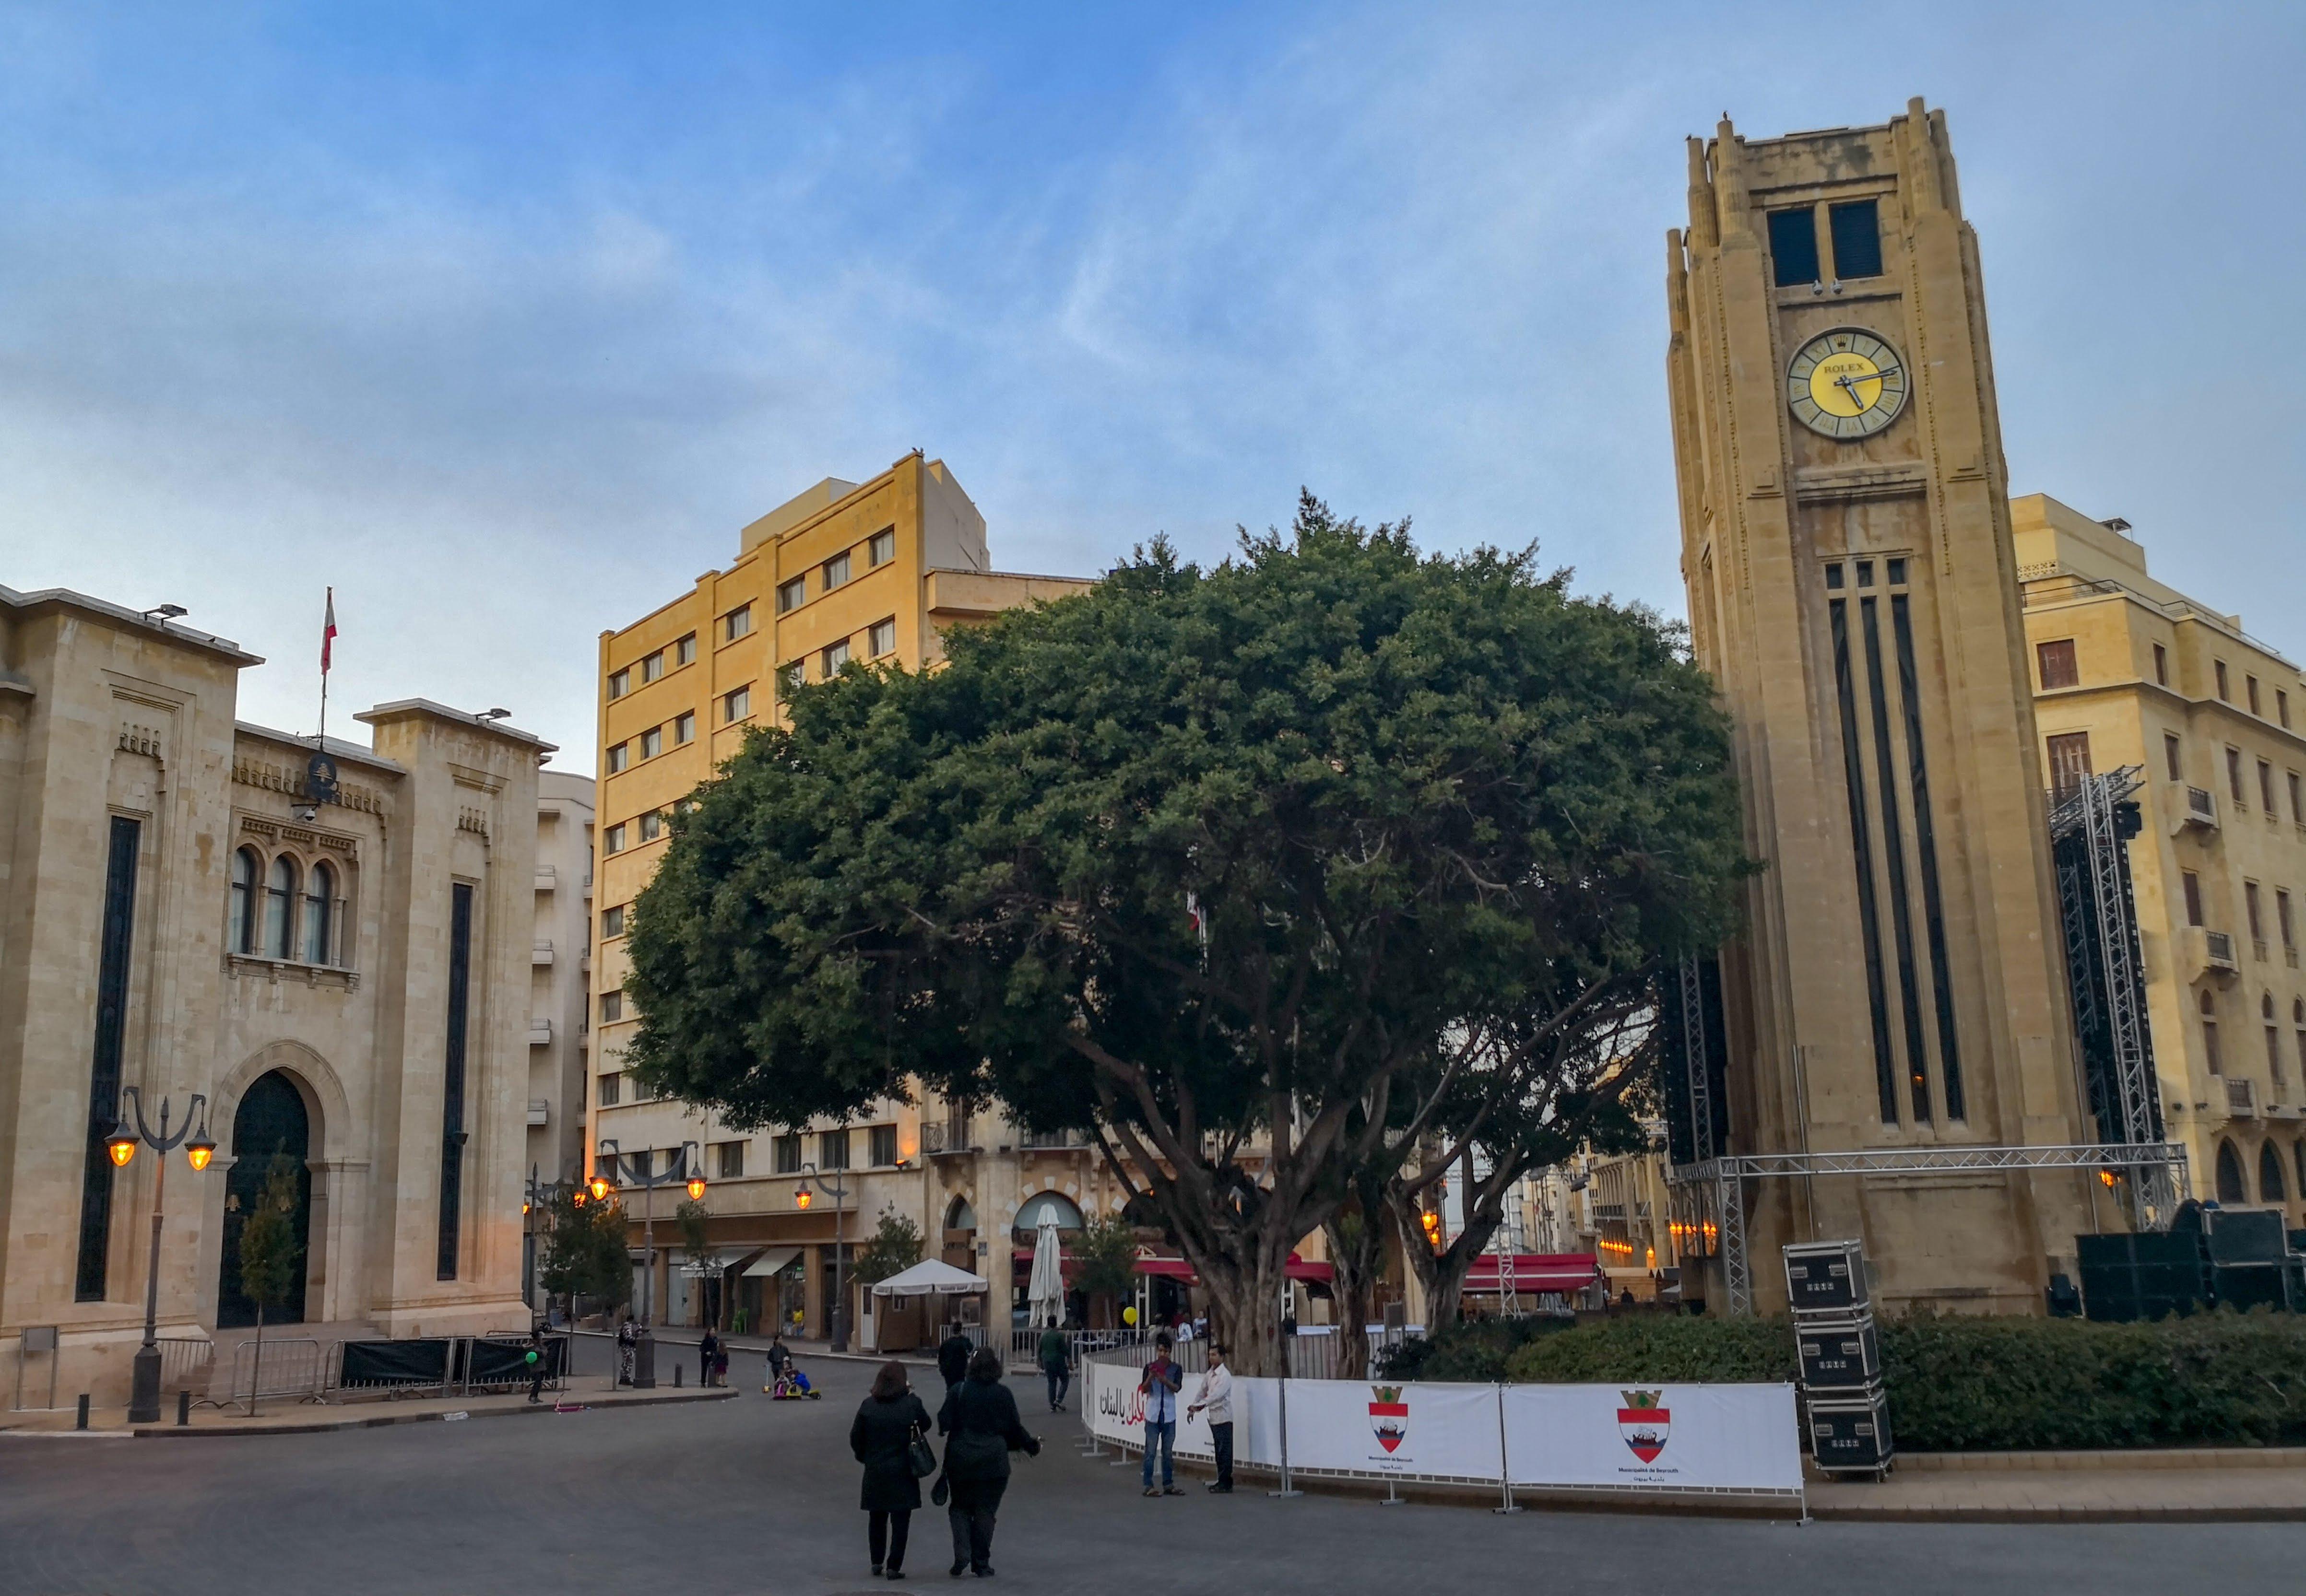 Downtown Beirut - Nijmeh Square